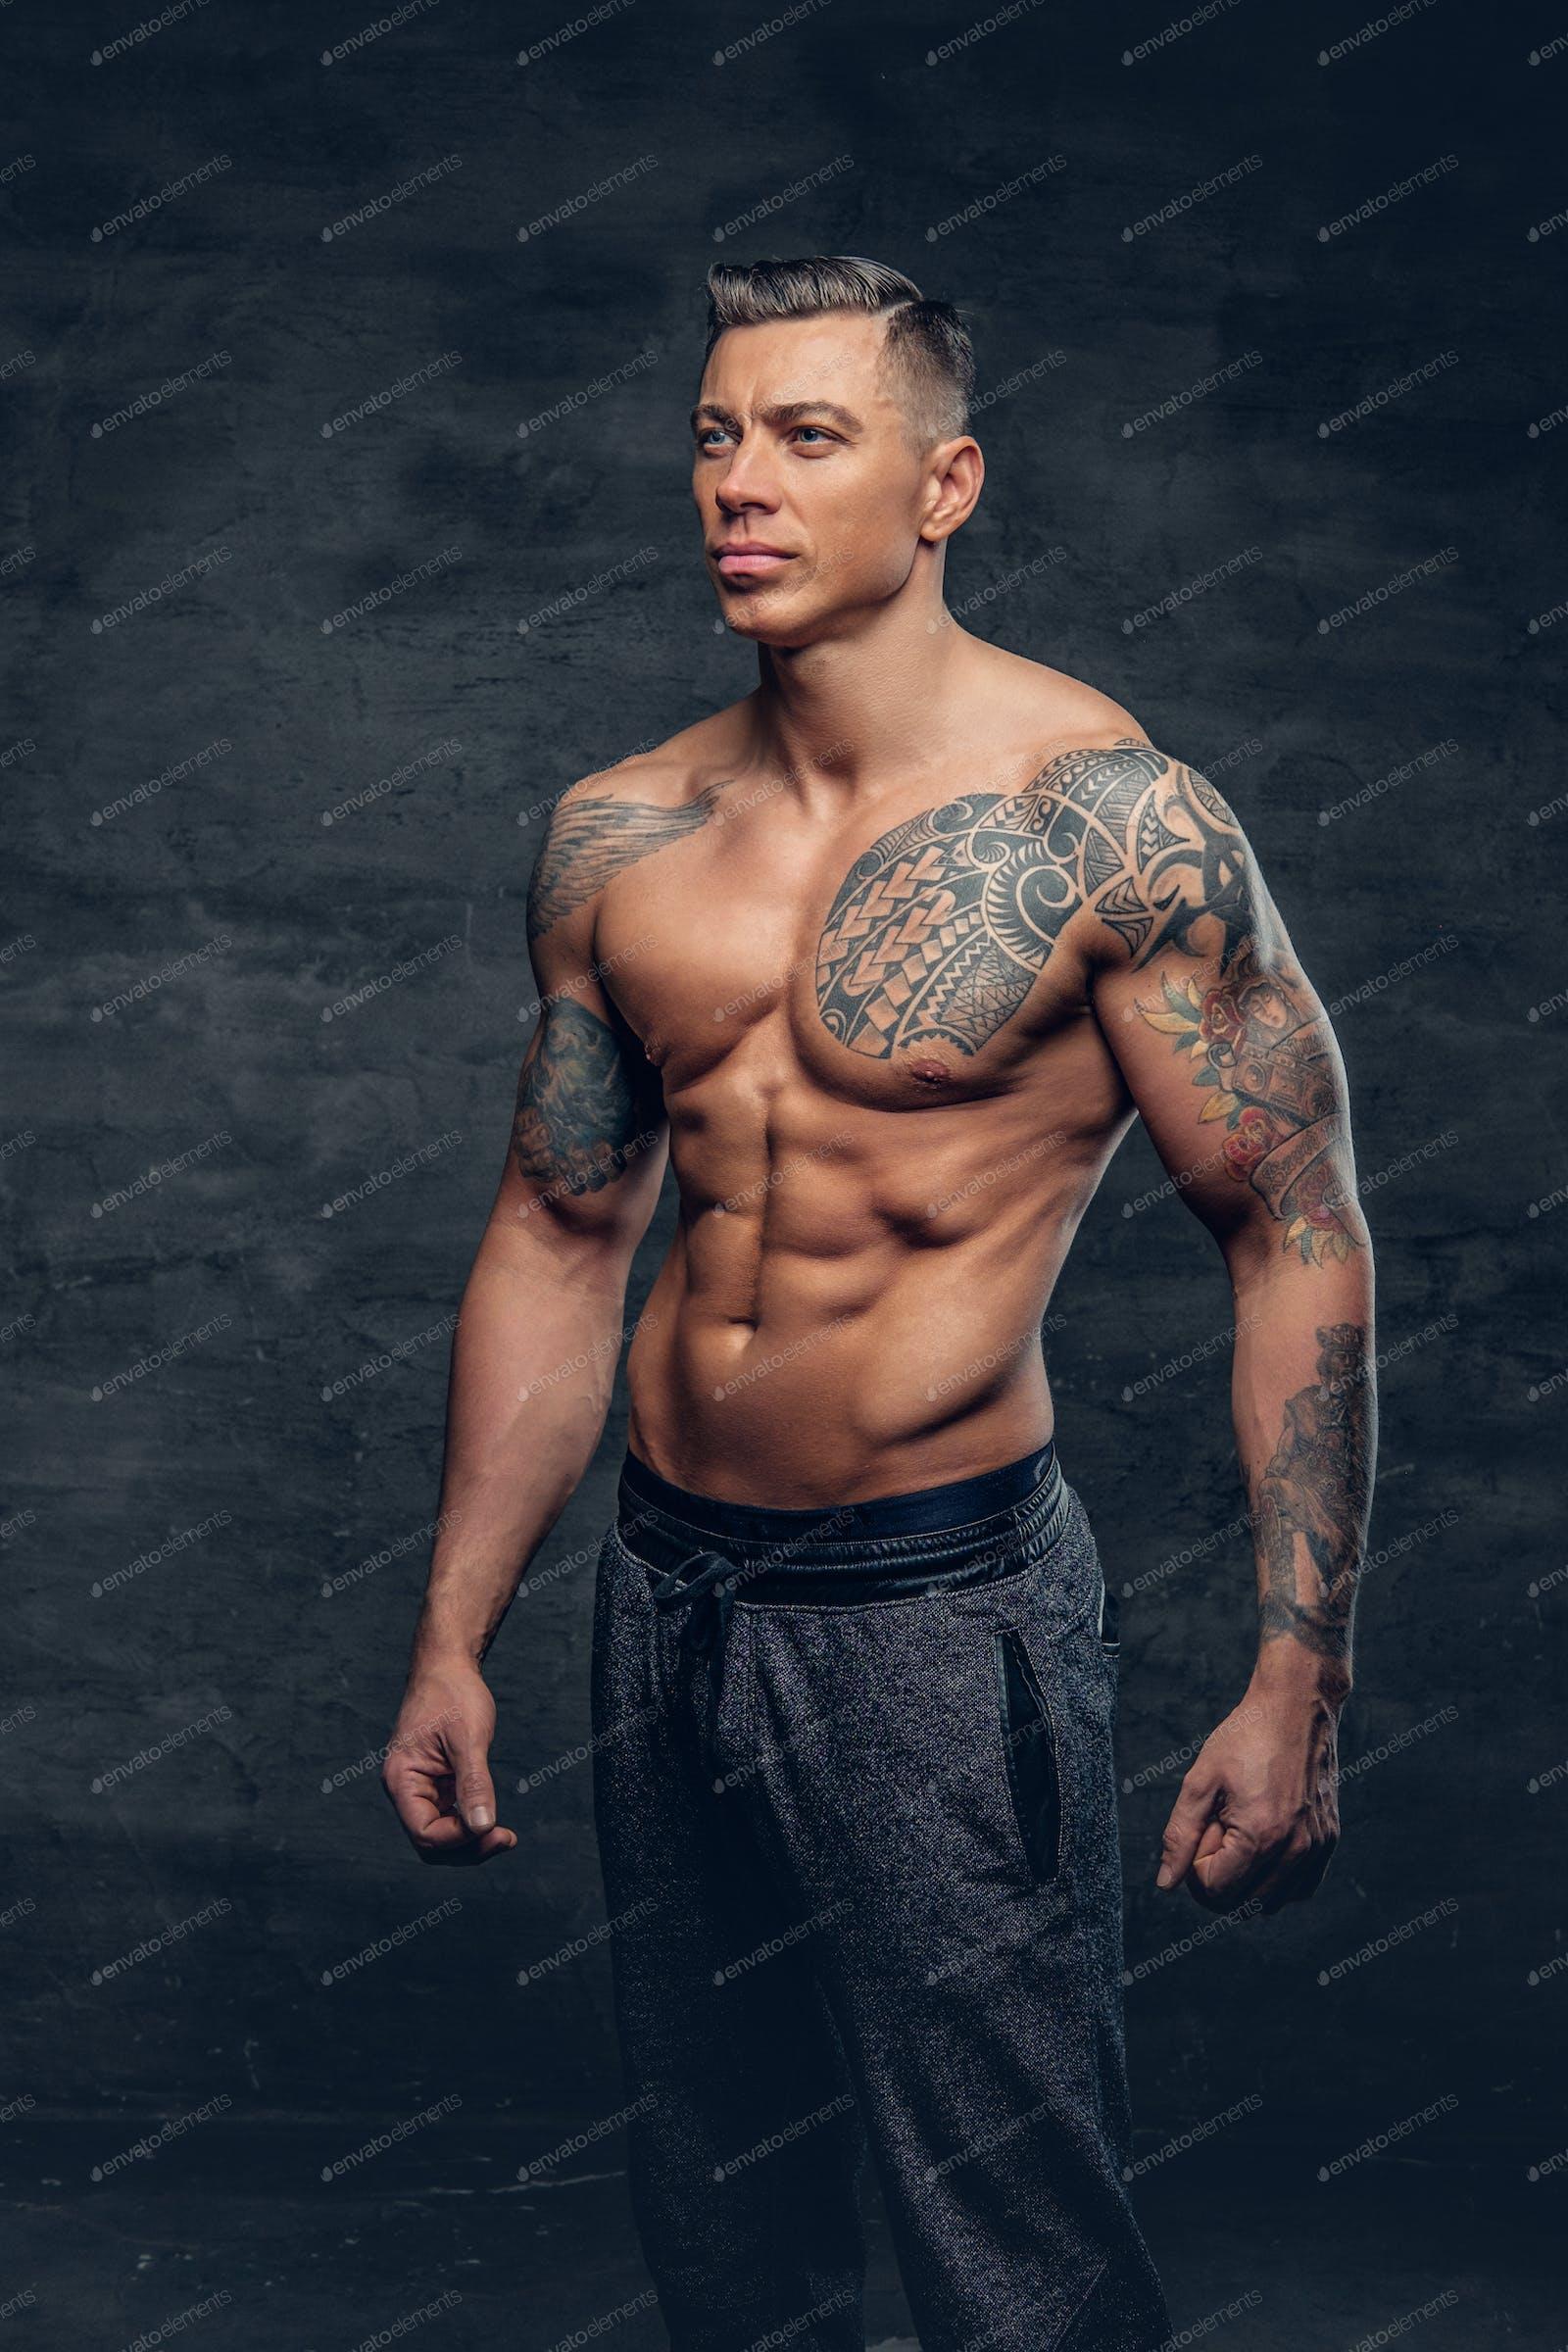 Tattoos muskulöse männer mit 110 Beste